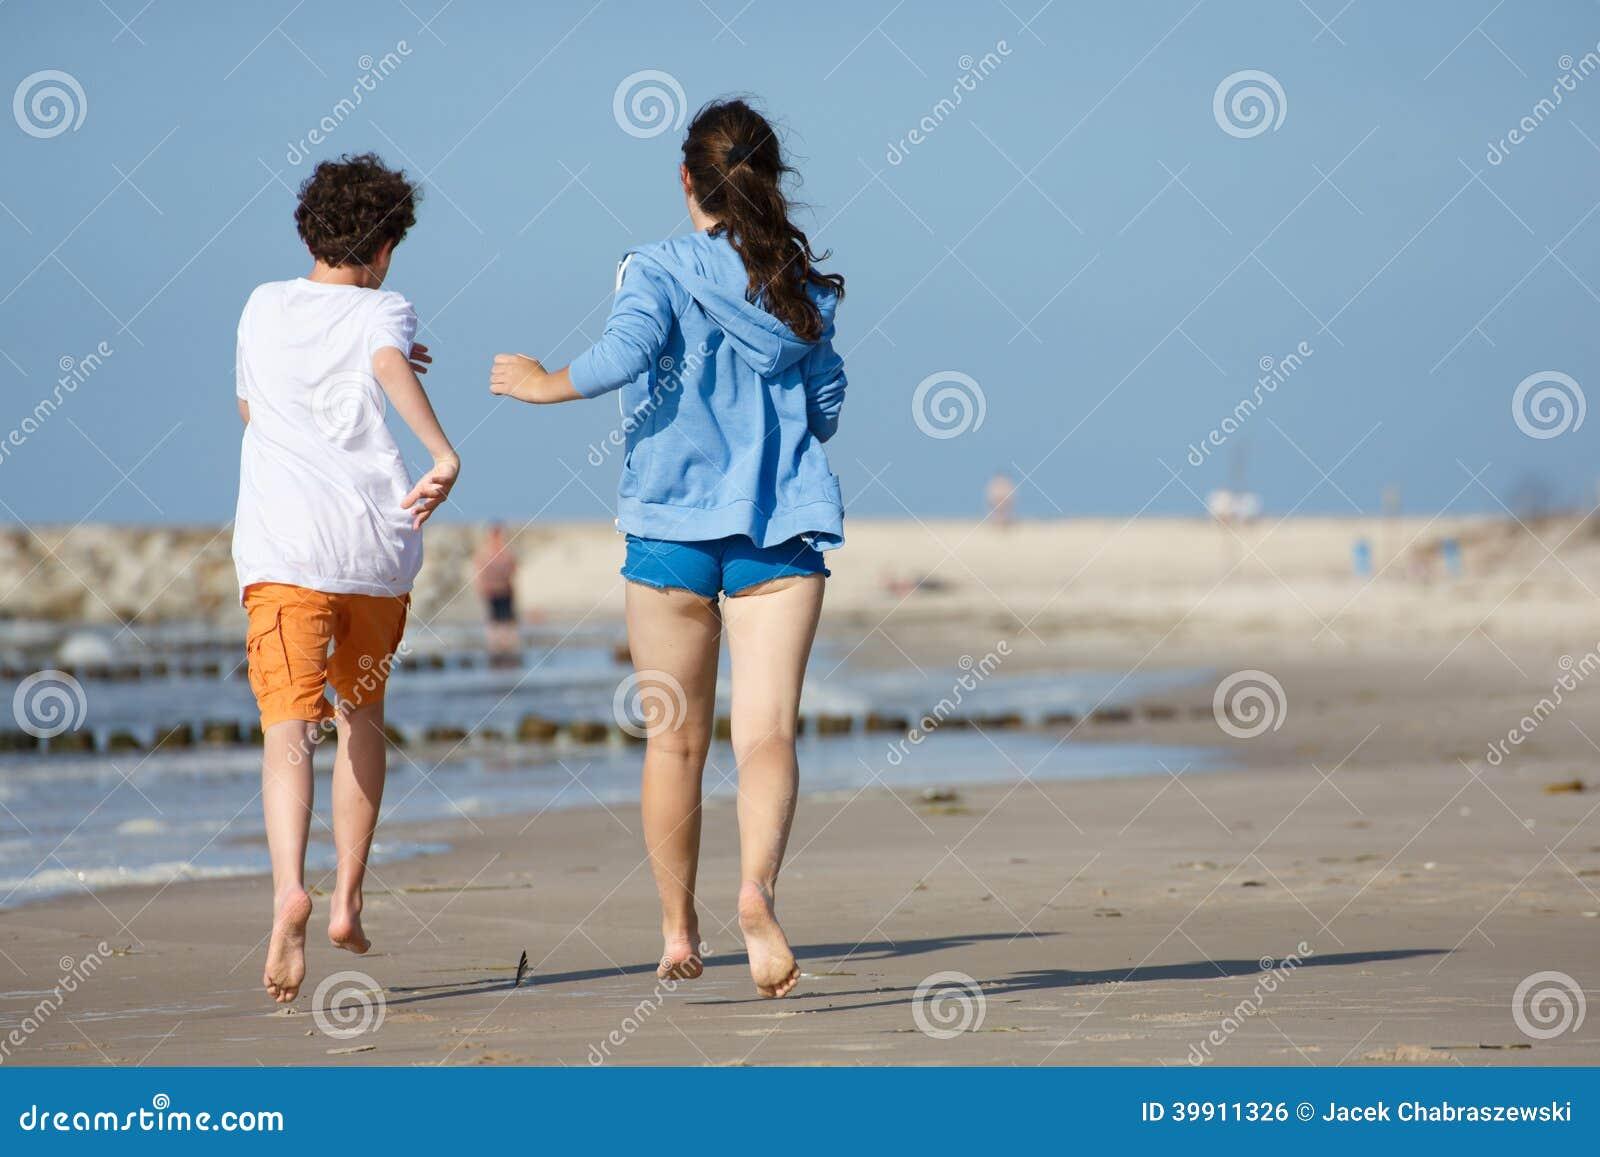 Girl And Boy Running On Beach Stock Photo - Image: 39911326 Girl Running On Beach